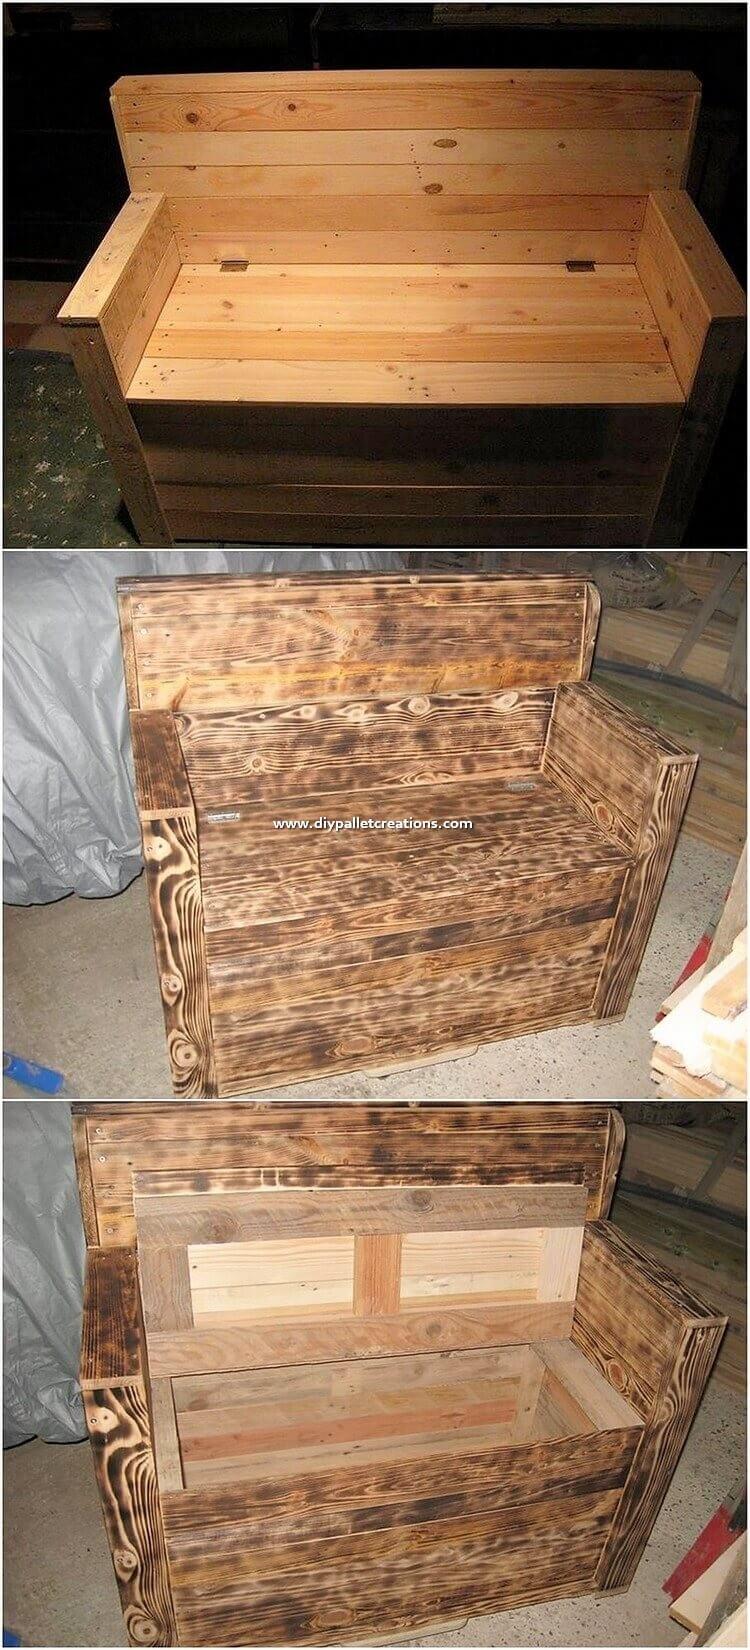 Pallet-Seat-with-Storage